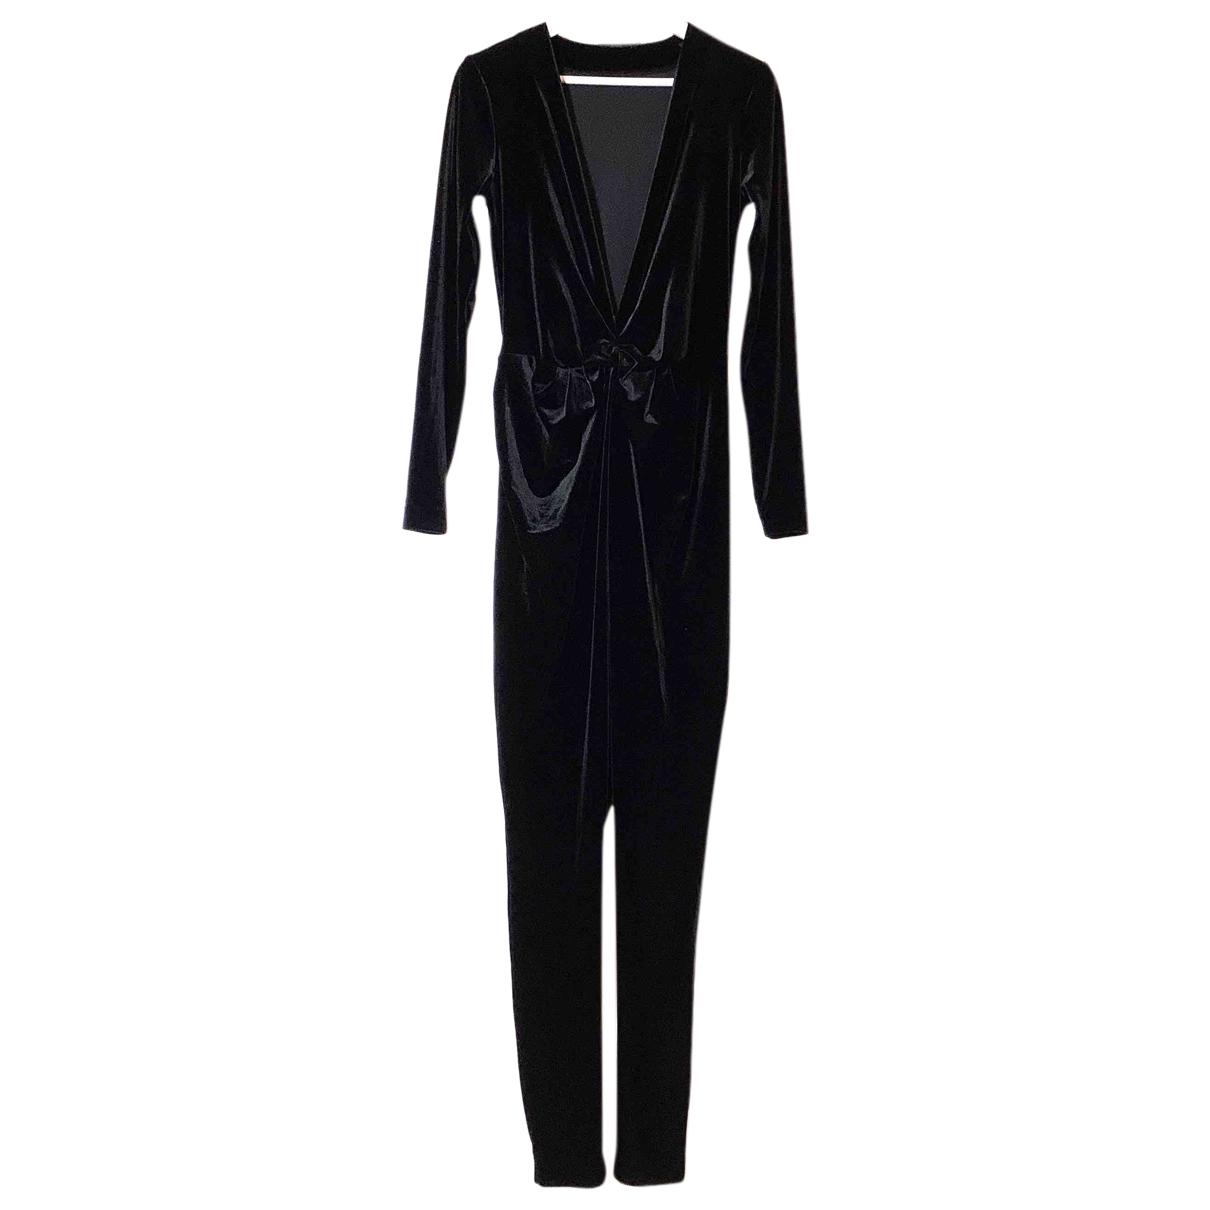 Cos \N Black jumpsuit for Women S International